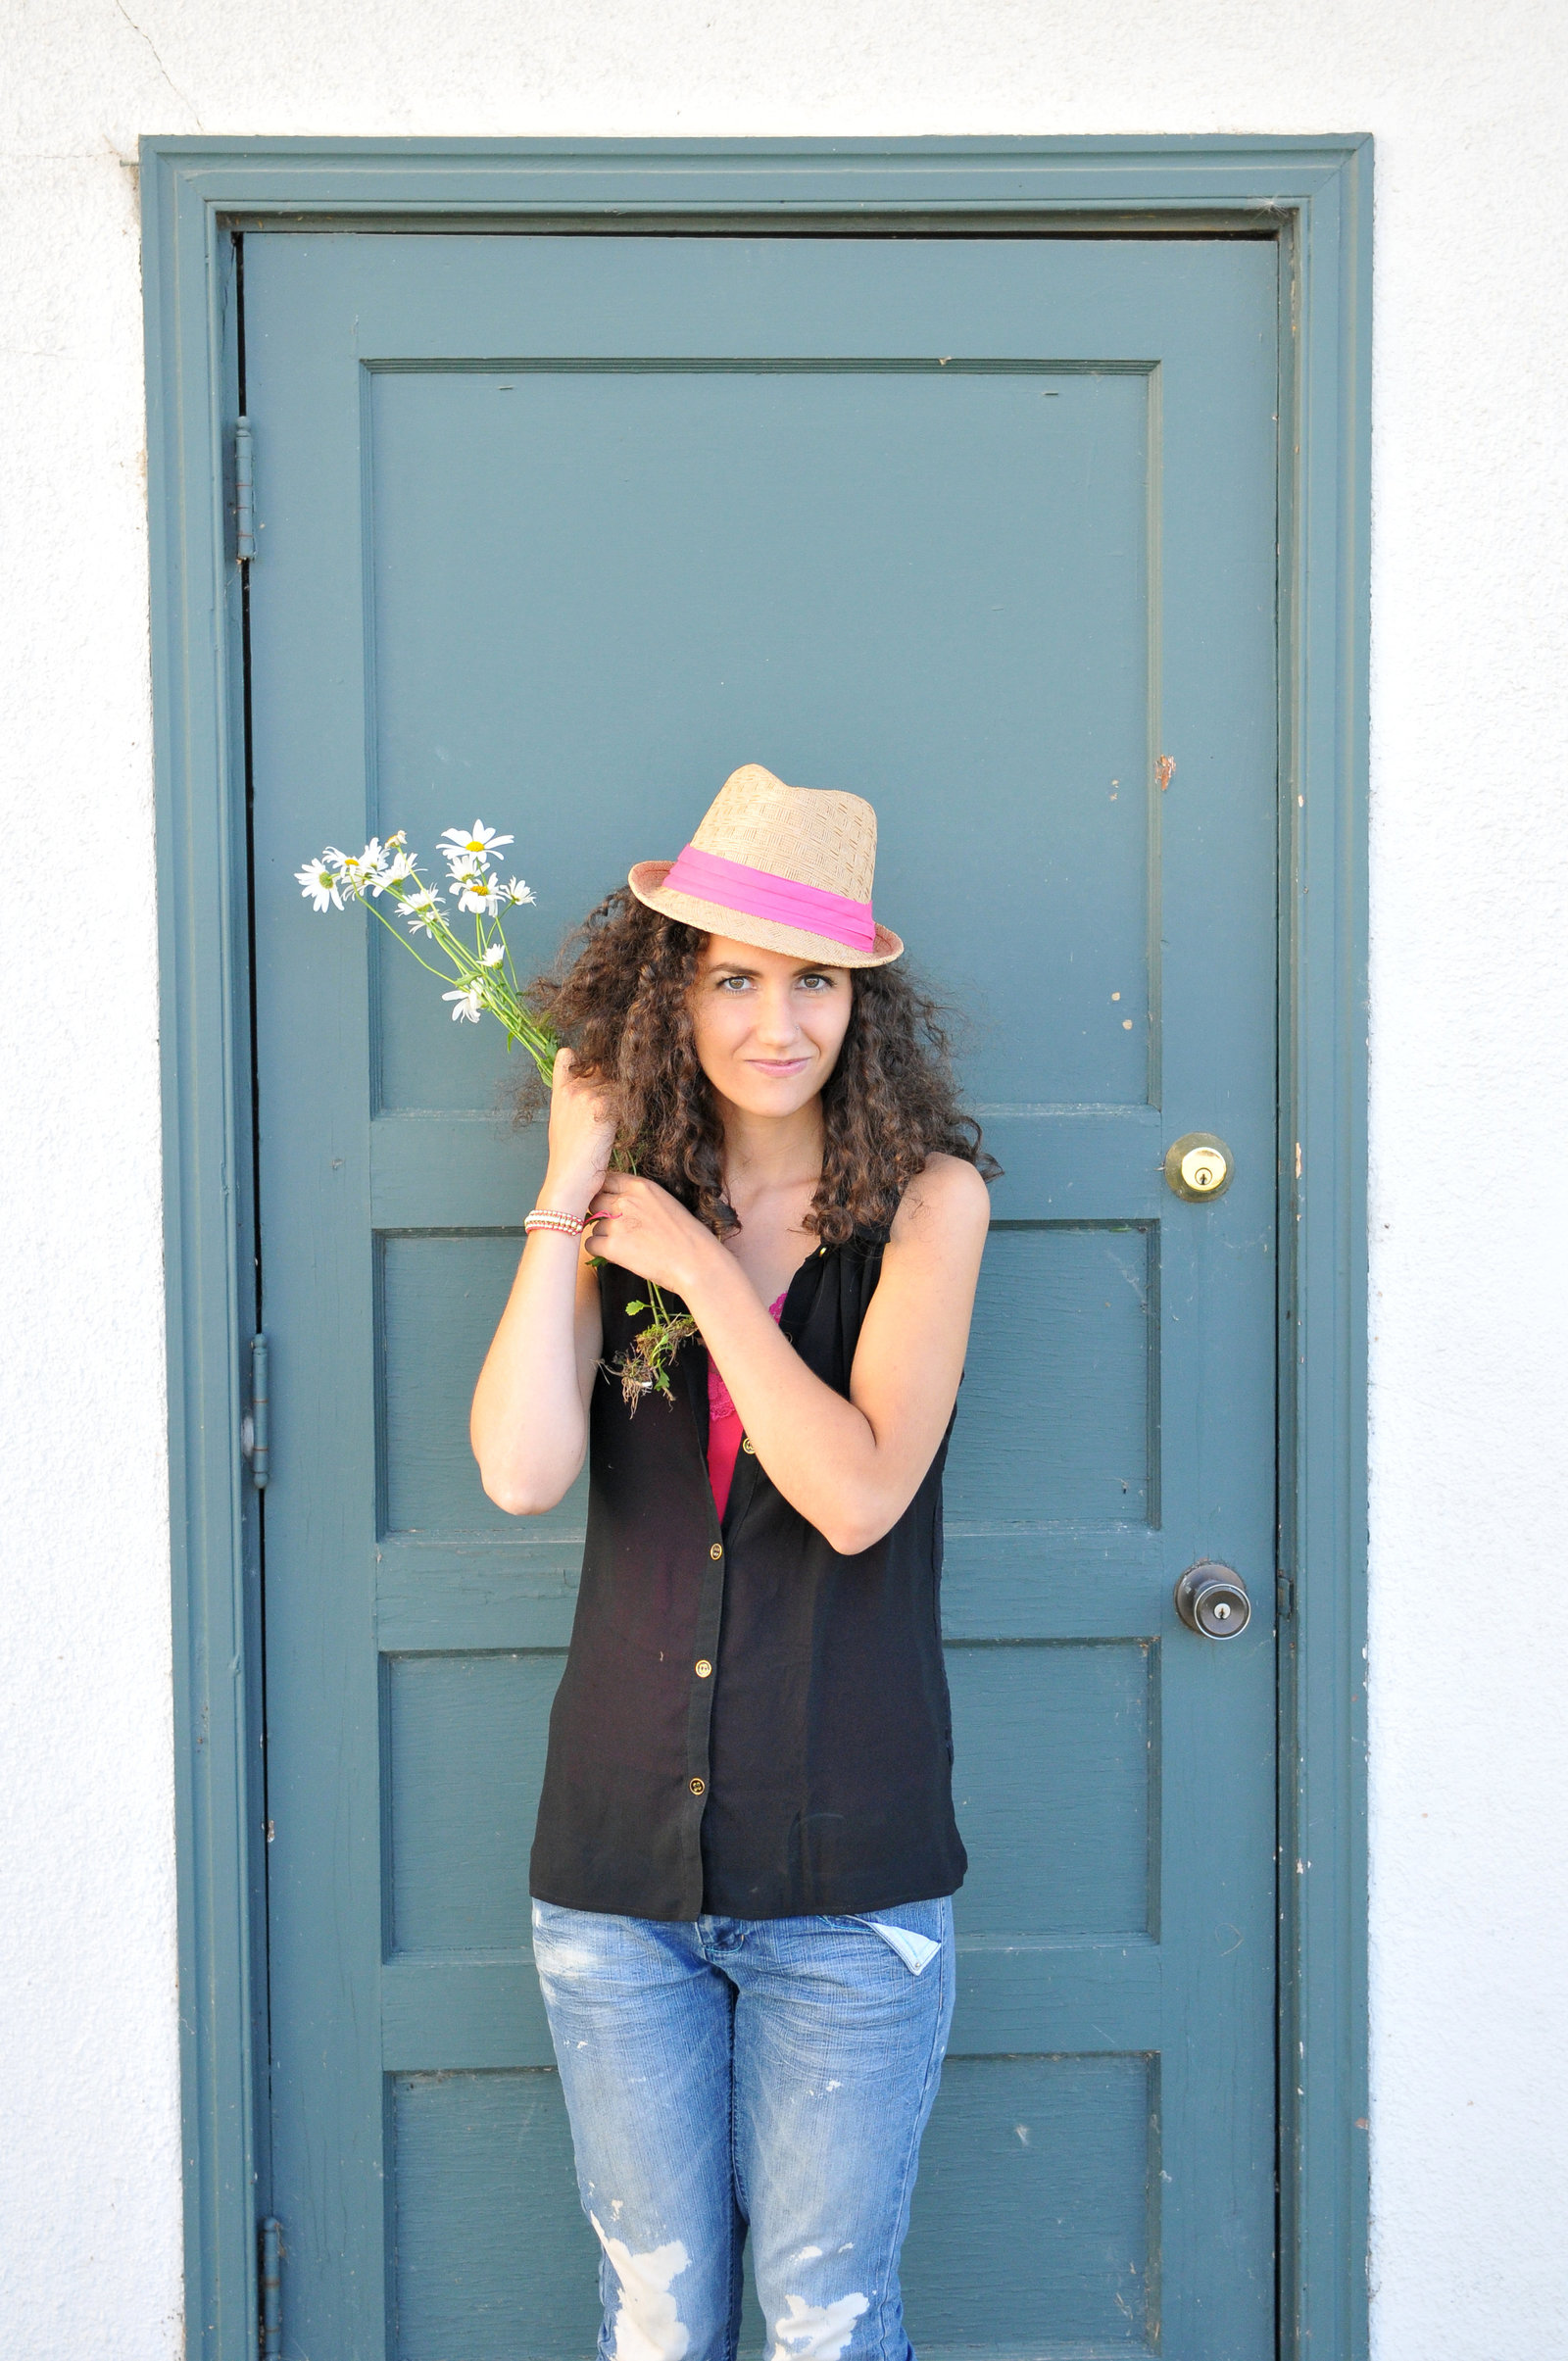 NiNi Flowers Blue Doora by Melissa E Earle